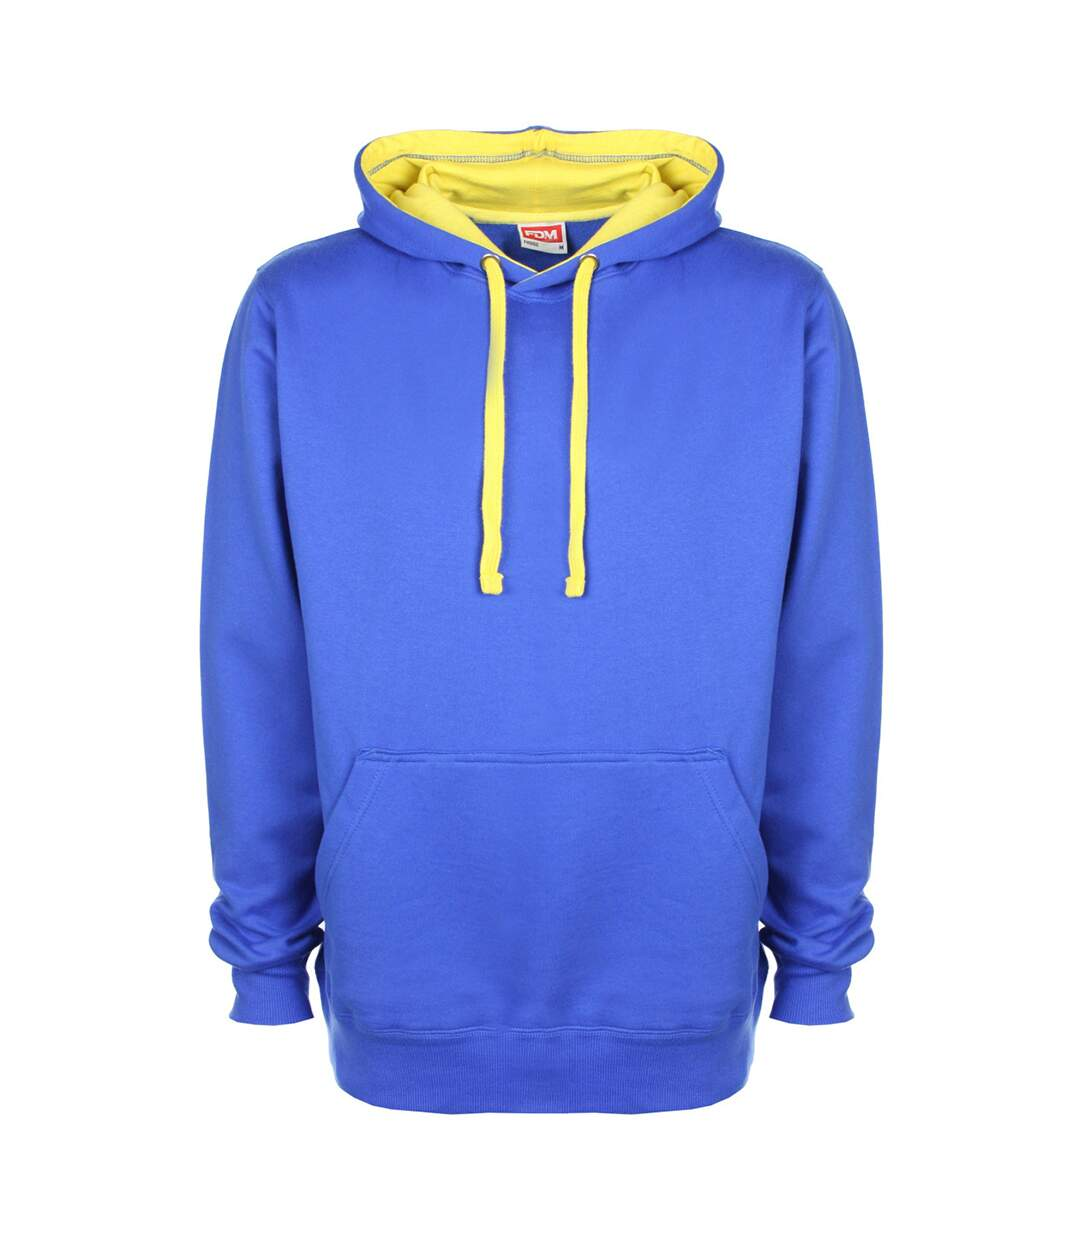 FDM Unisex Contrast Hooded Sweatshirt / Hoodie (300 GSM) (Royal/Empire Yelllow) - UTBC2025